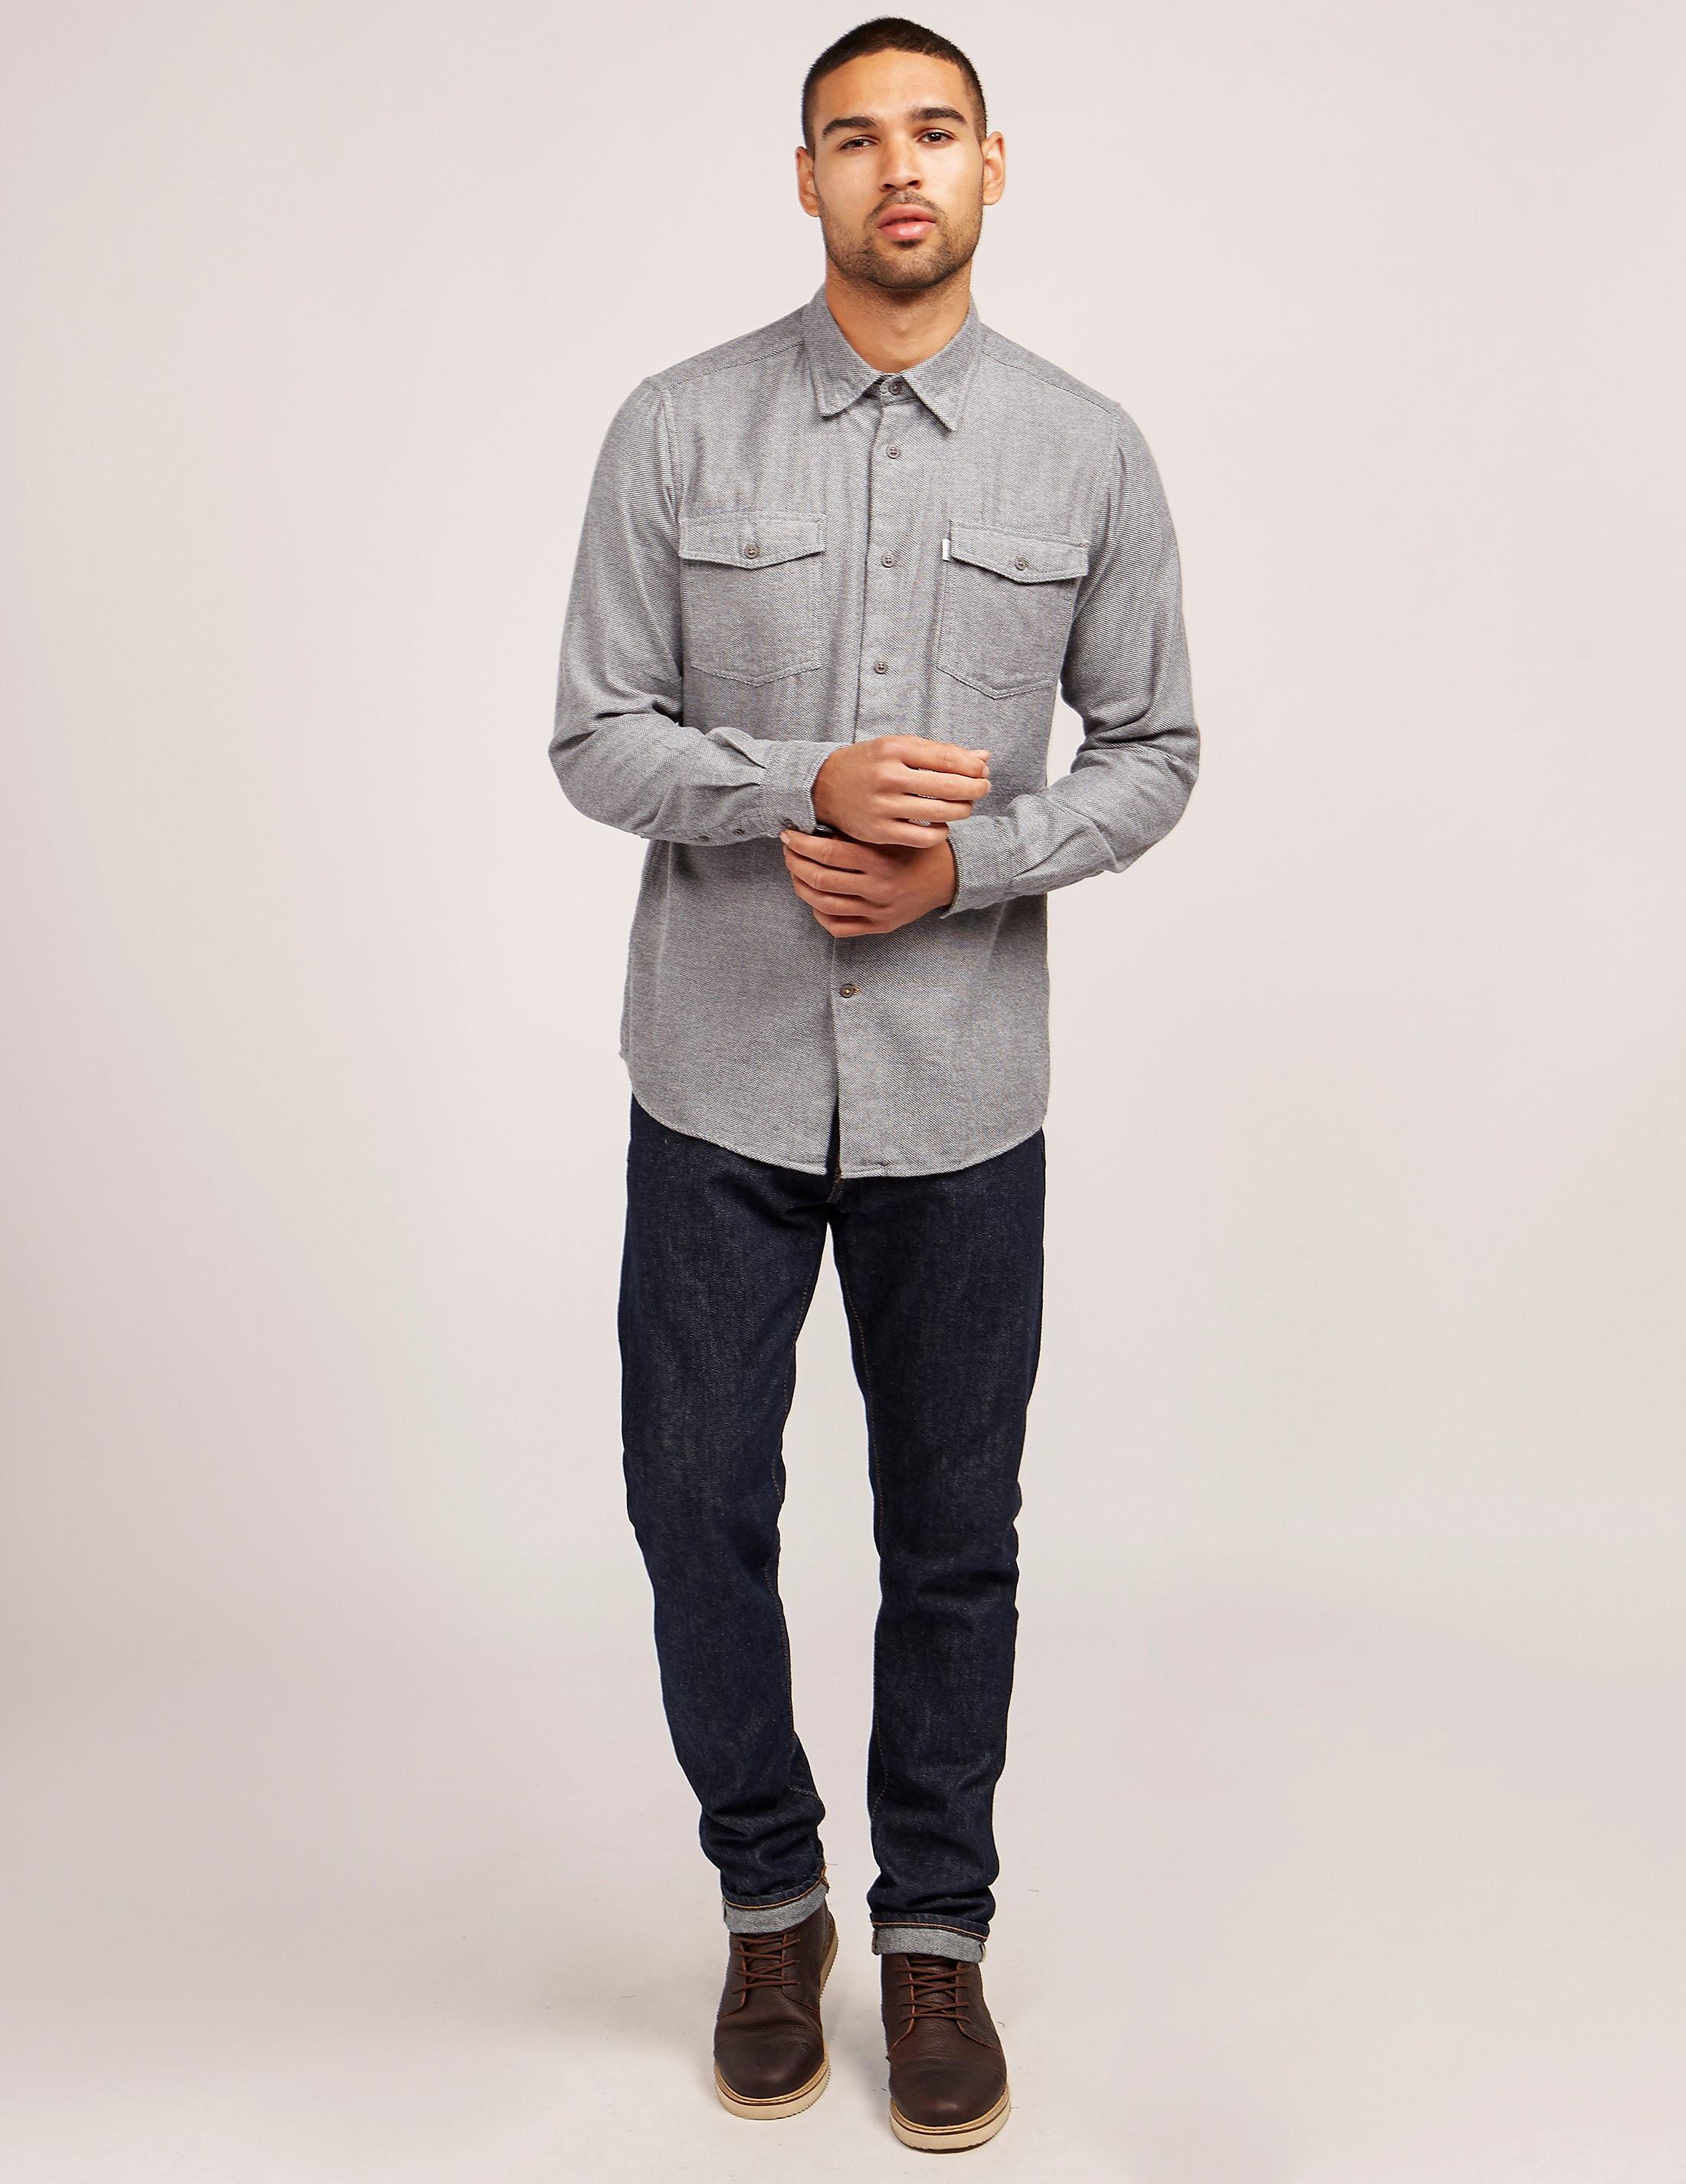 Barbour Long Sleeve Shirt